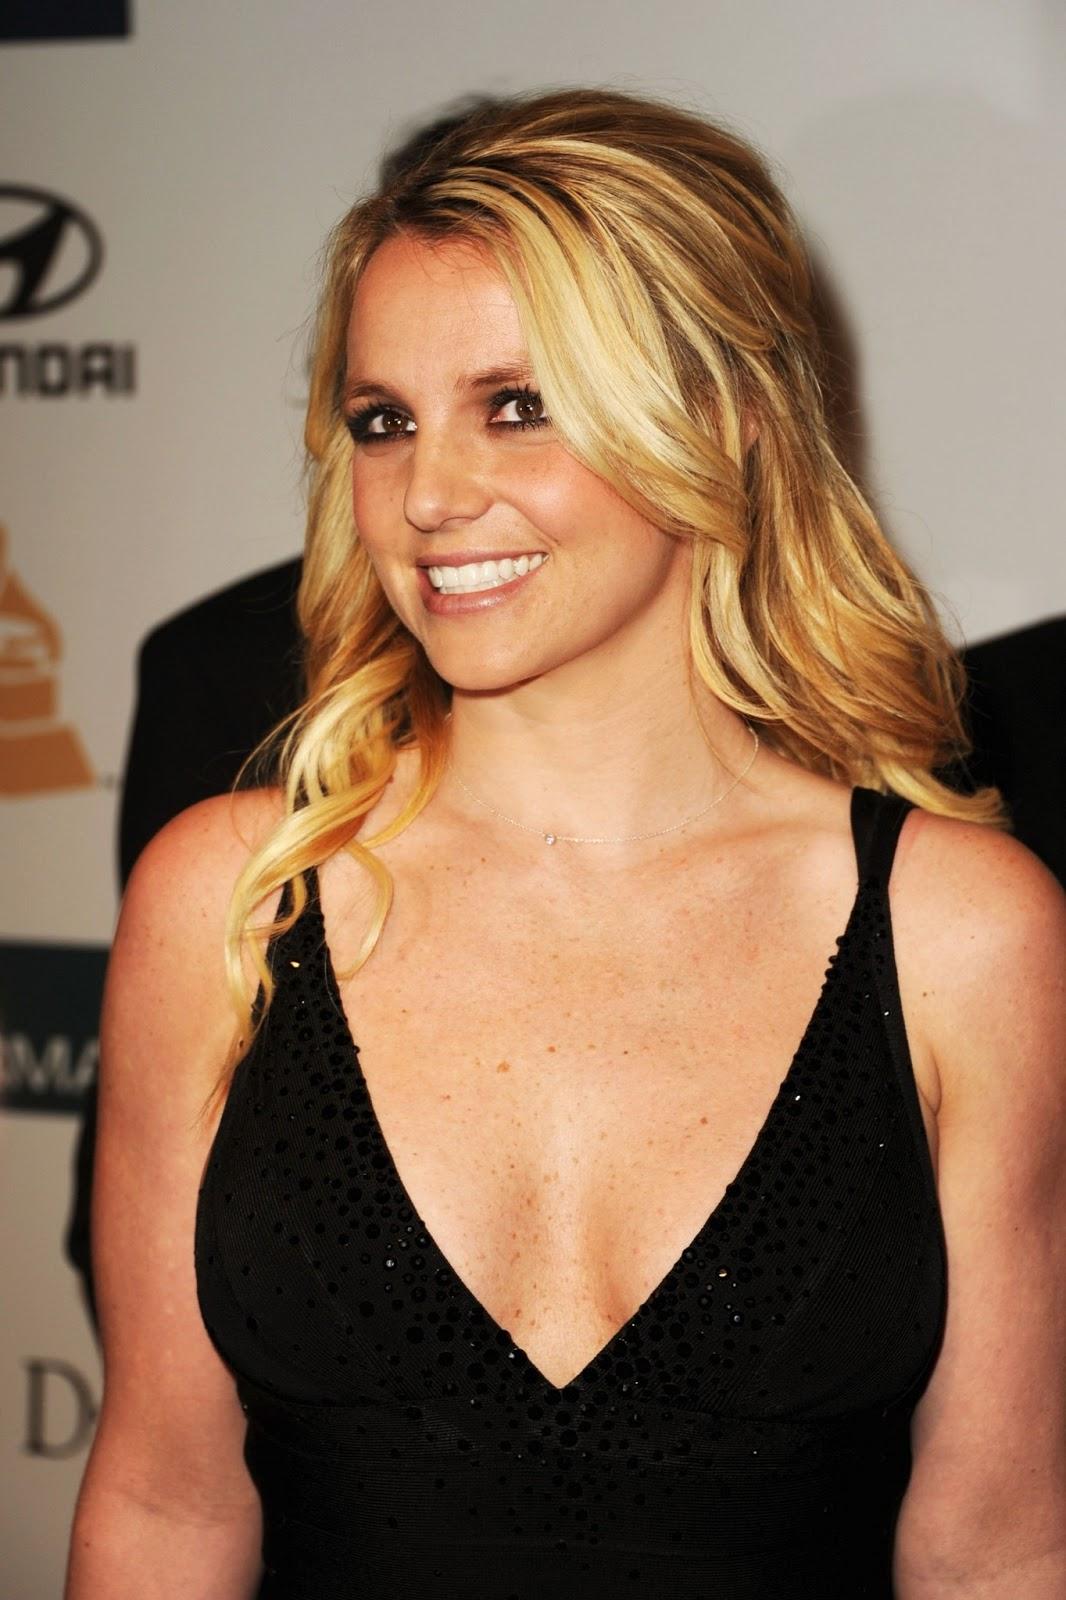 Britney Spears: Britney Spears Breast Pics Britney